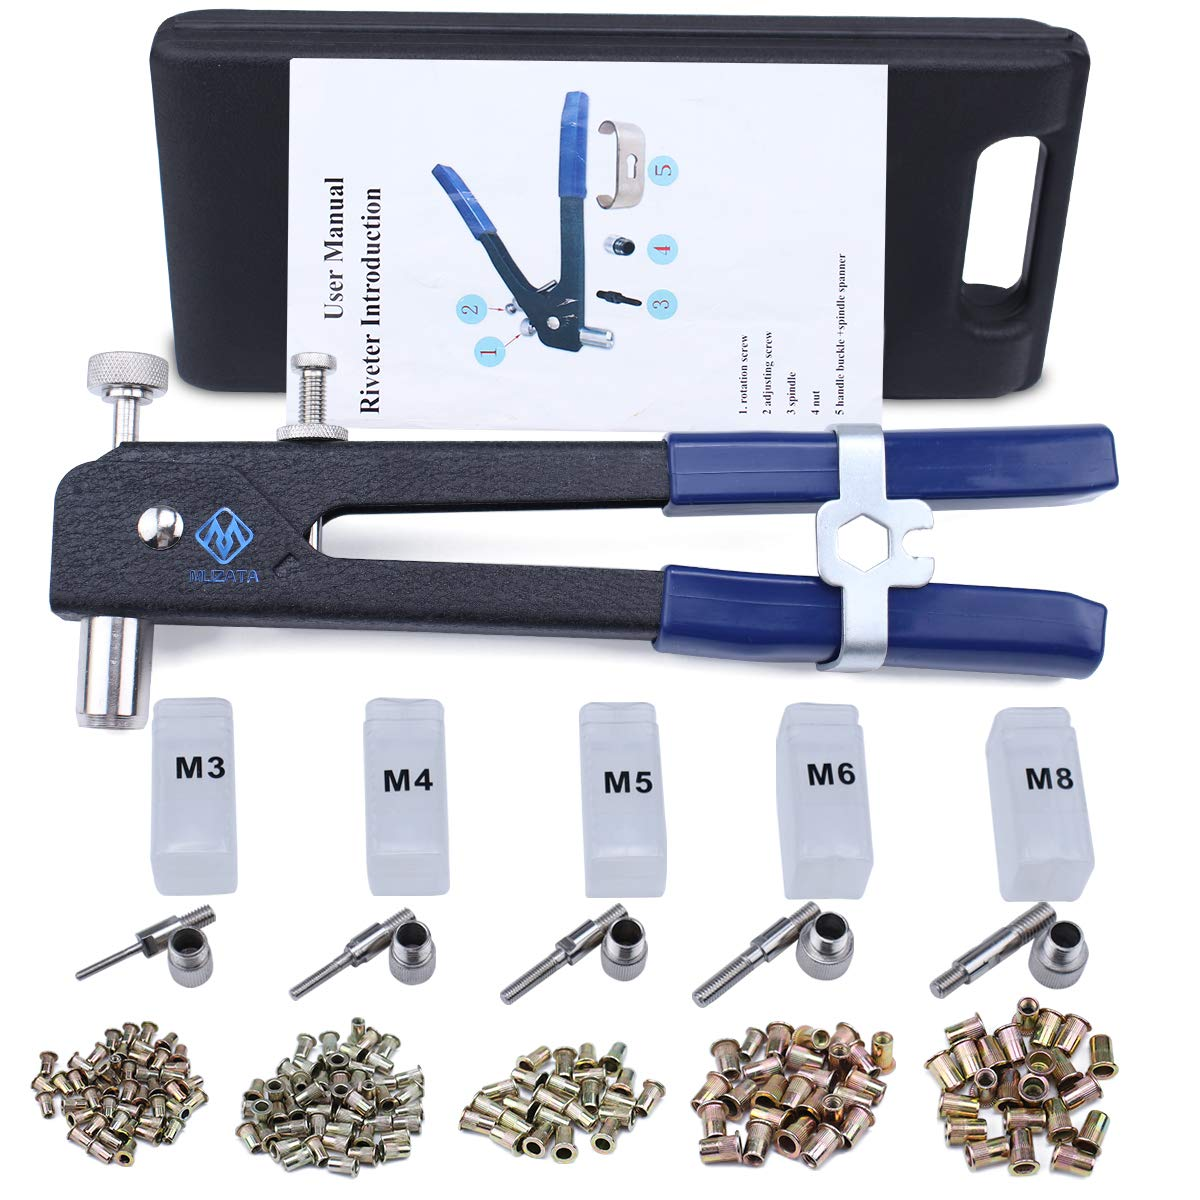 Muzata Hand Rivet Gun Nut Setter Kit,Thread Blind Riveting Tools,Wrench Nut Sert,5pc Metric Mandrels and 130pc M3/M4/M5/M6/M8 Rivnuts,Rugged Carrying Case RK01